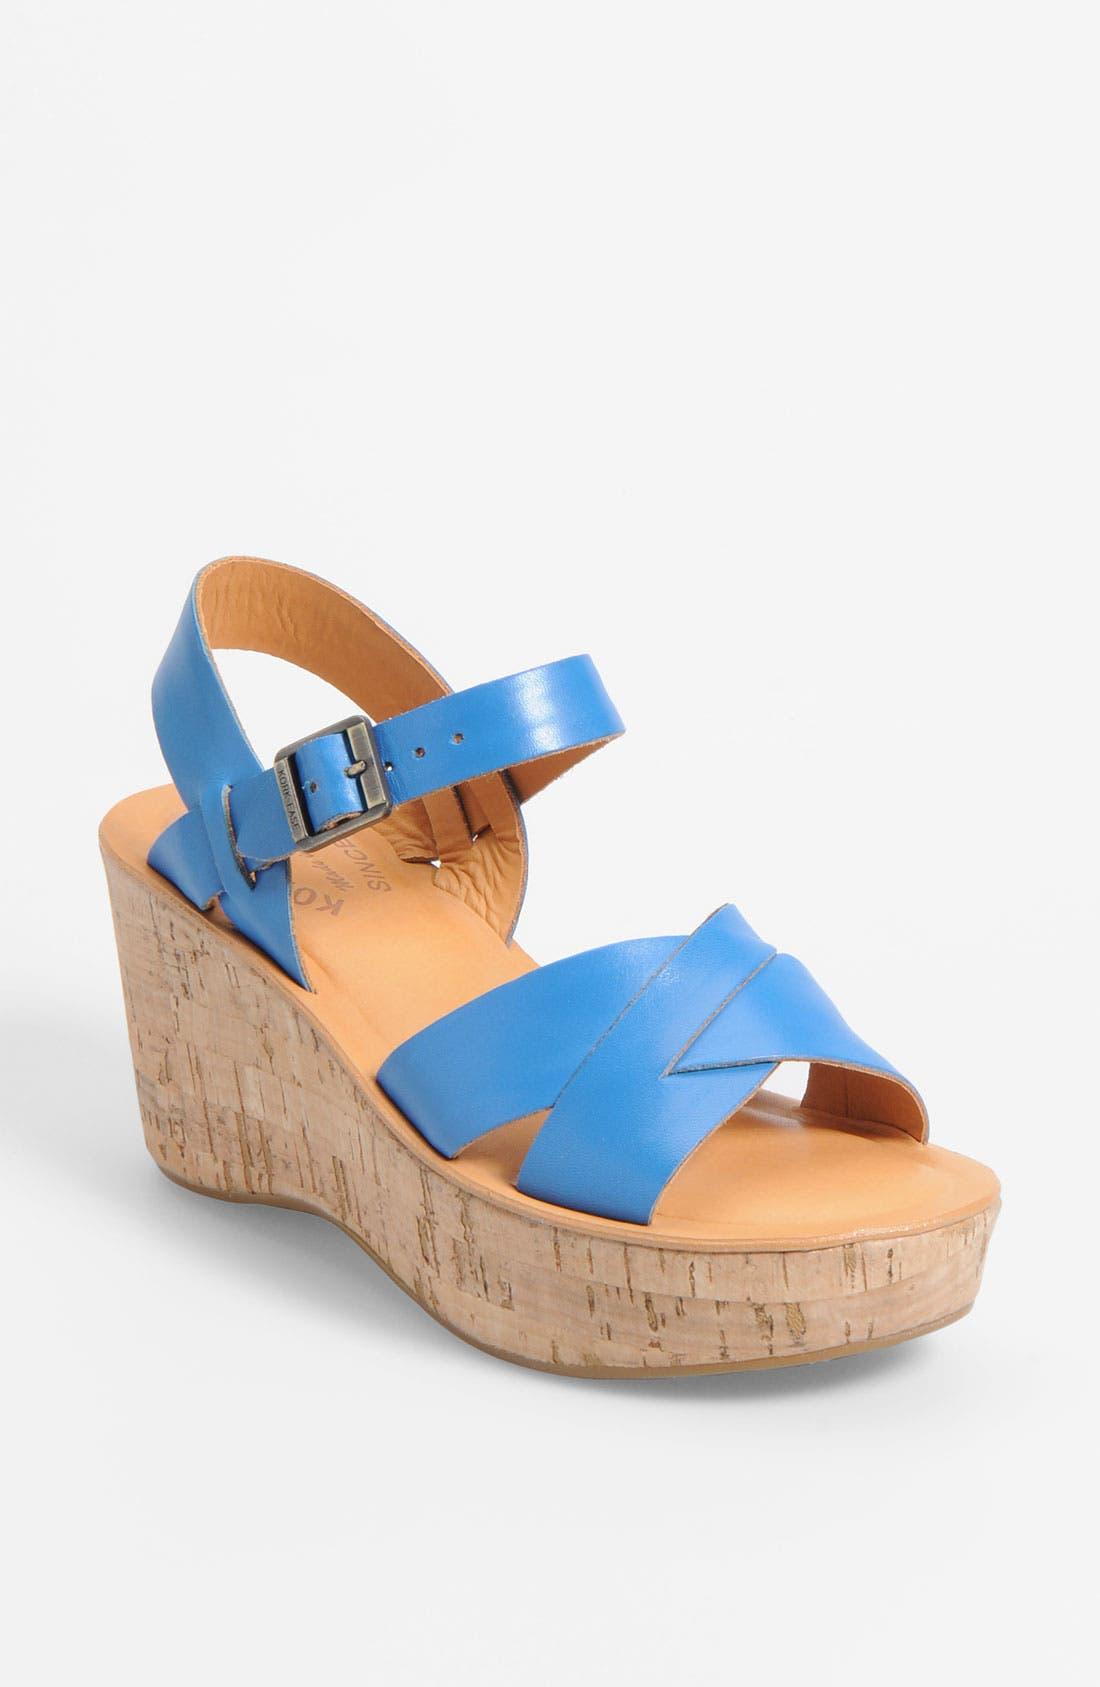 Main Image - Kork-Ease 'Ava' Wedge Sandal (Nordstrom Exclusive)